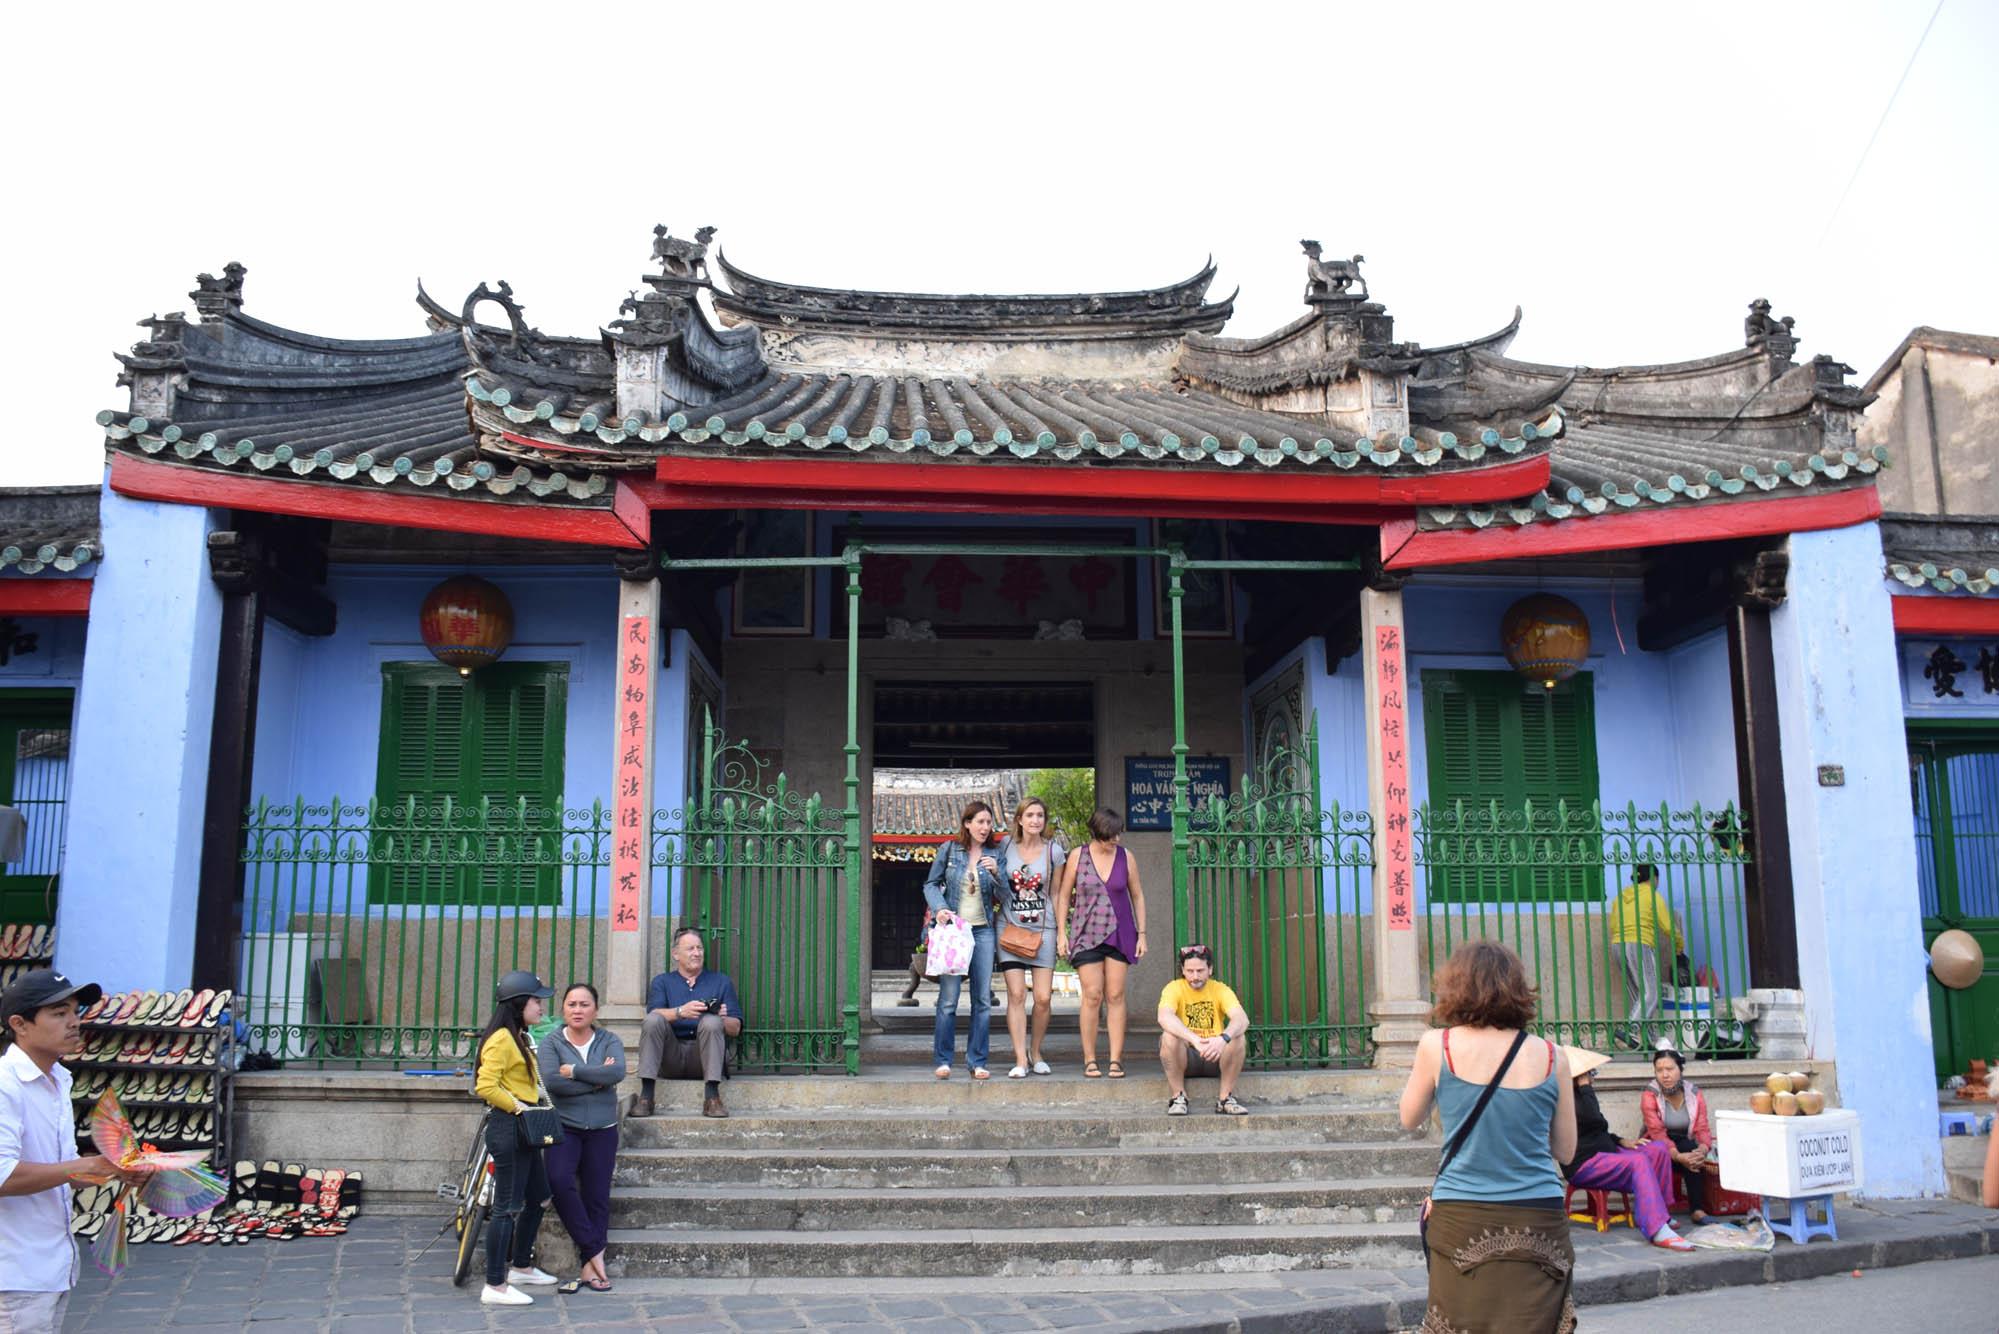 Trung Hoa Assembly Hall, também chamada de Duong Thuong Assembly Hall hoi an